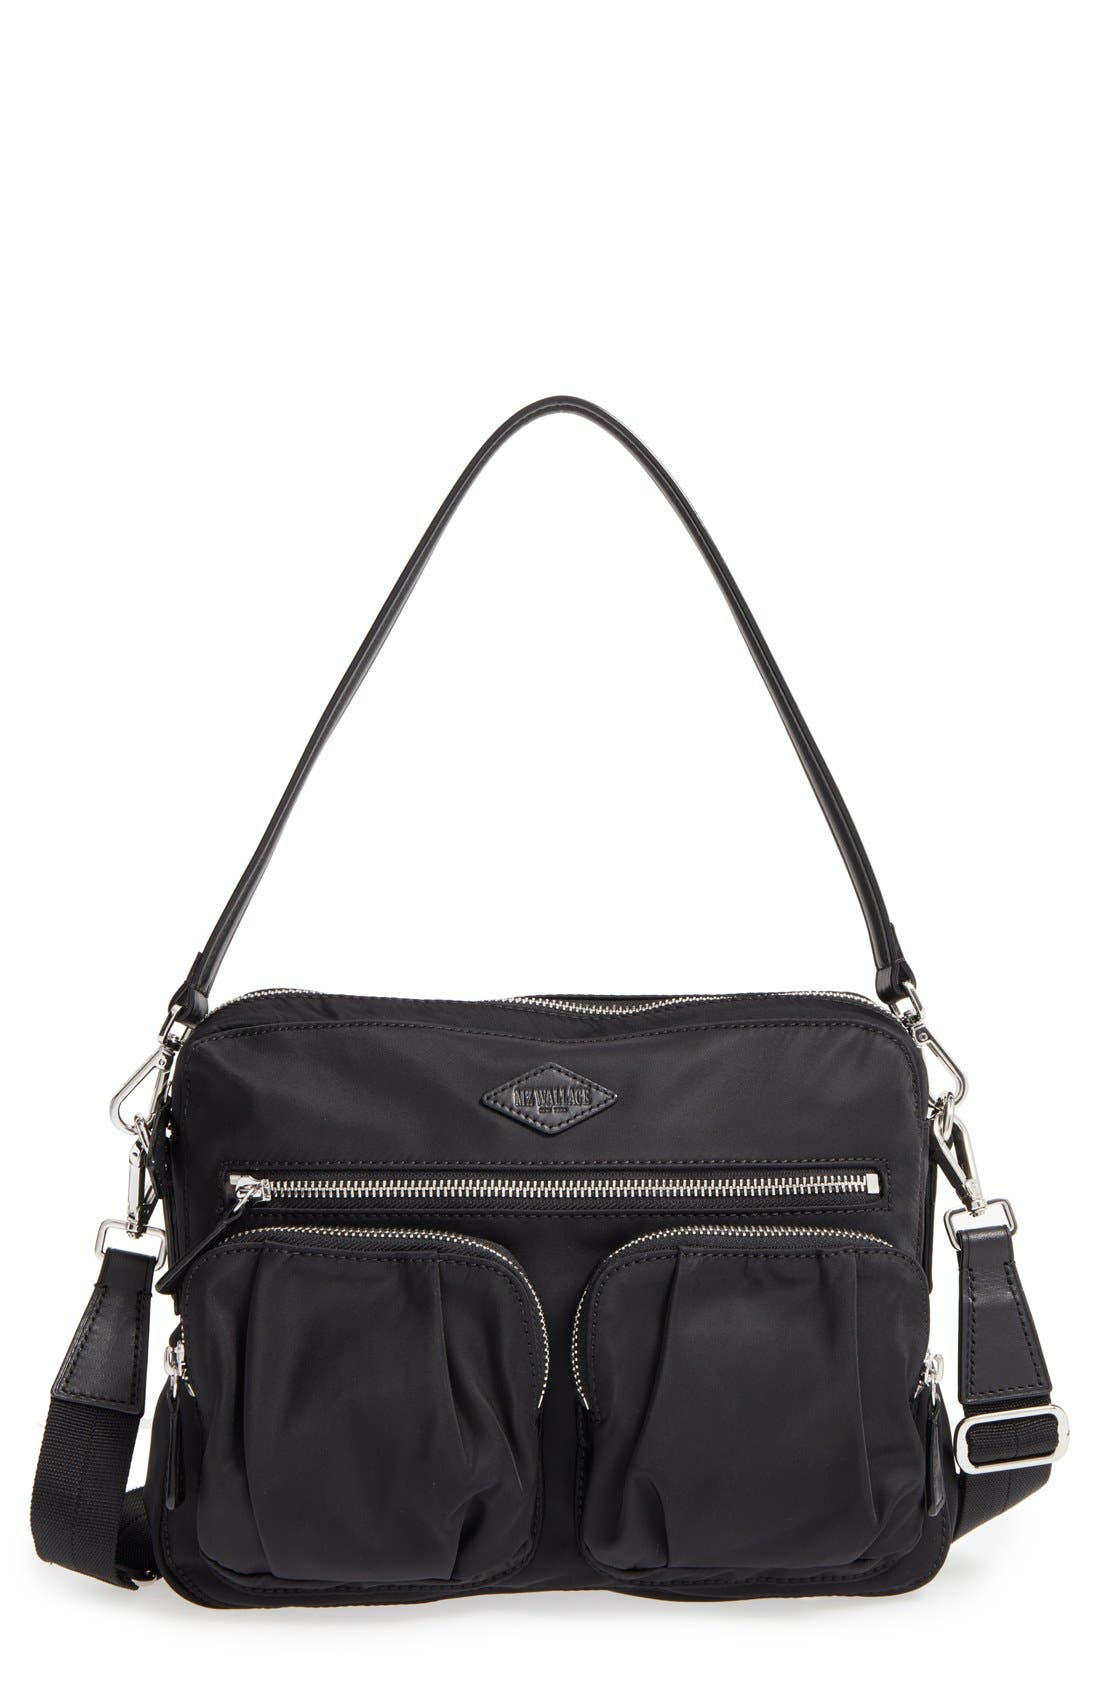 MZ WALLACE Small Roxy Bedford Nylon Shoulder Bag